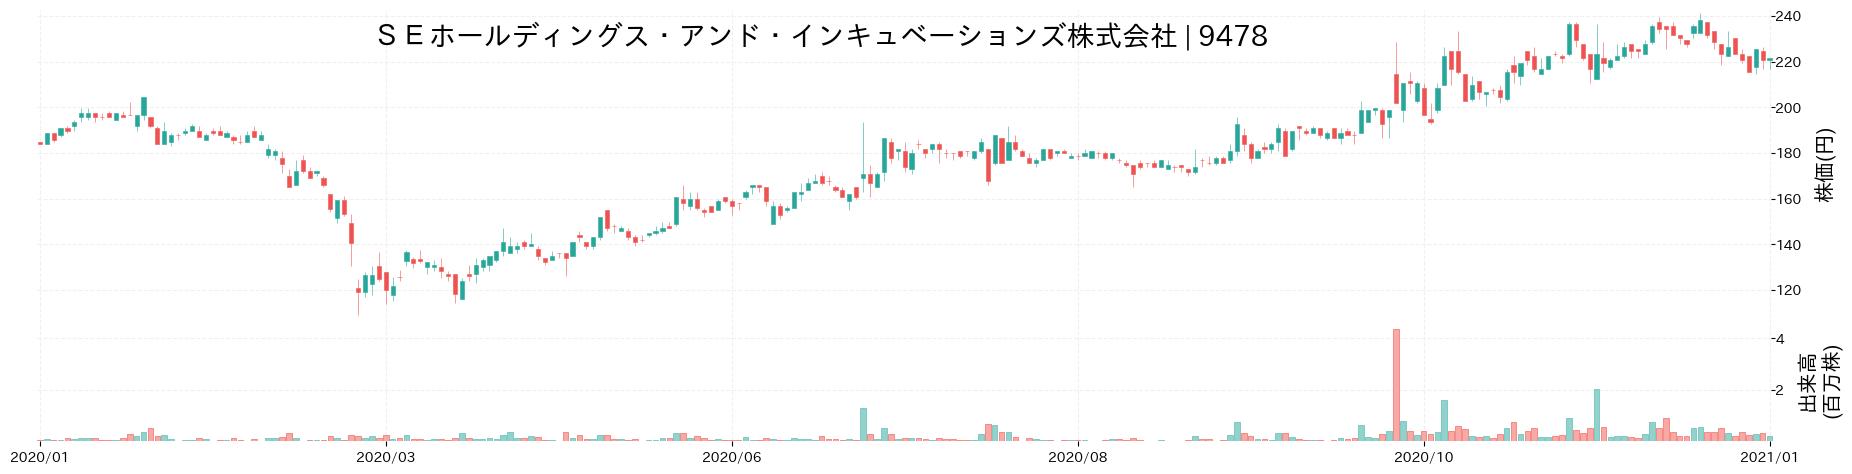 SEホールディングス・アンド・インキュベーションズ株式会社の株価推移(2020)